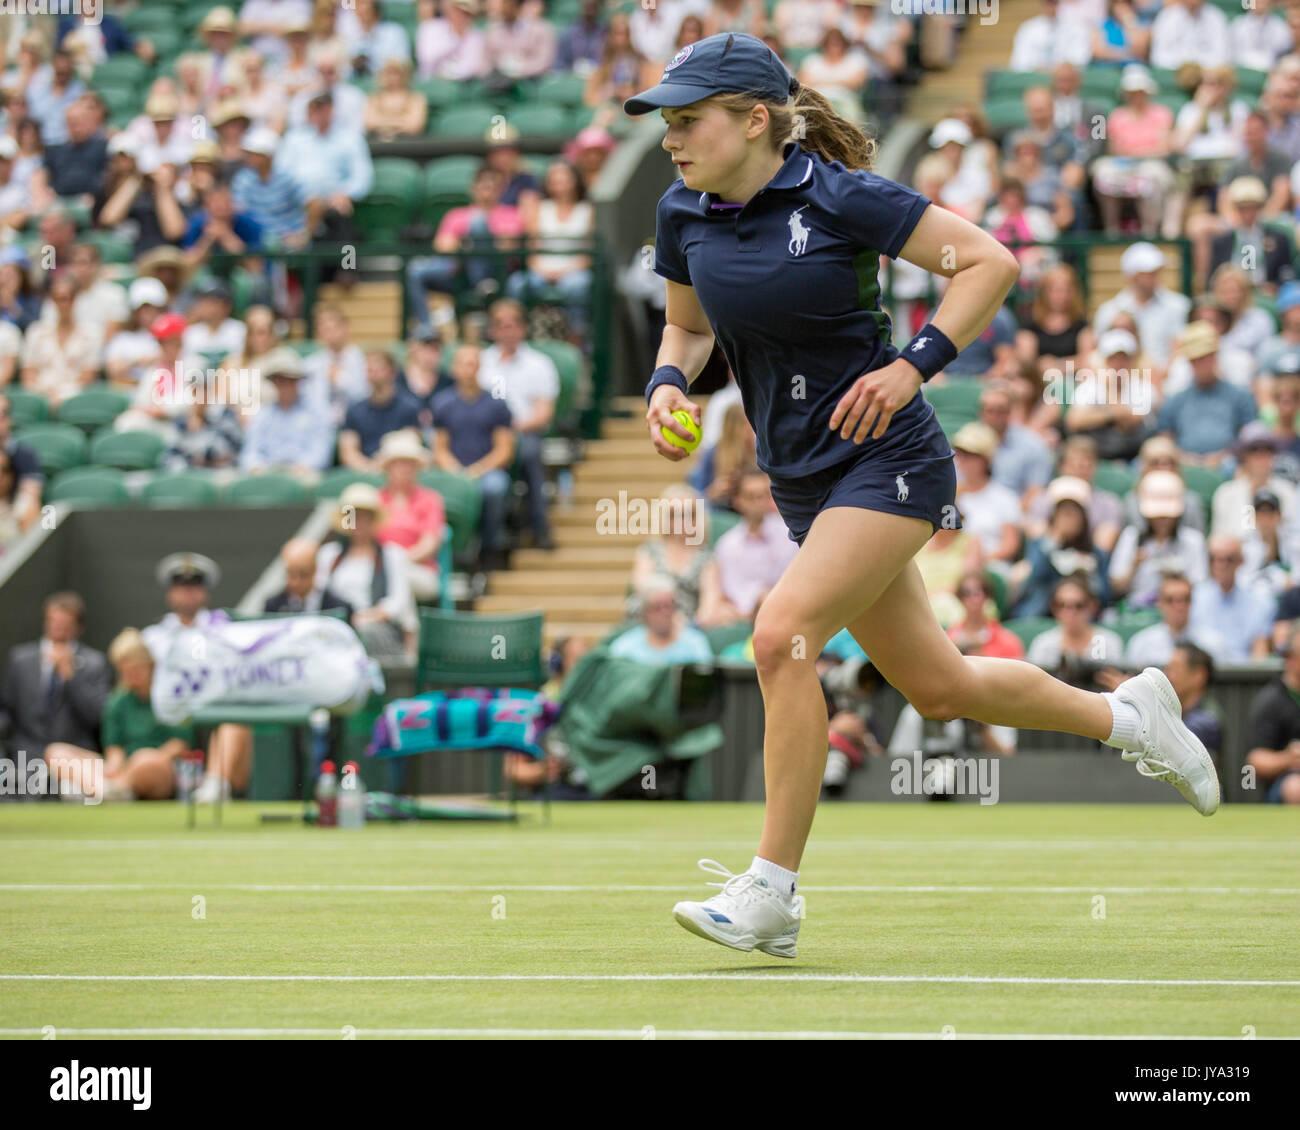 2017 Wimbledon Finals Brackets Back To The Future: Ball Girl Wimbledon Tennis Championships Stock Photos